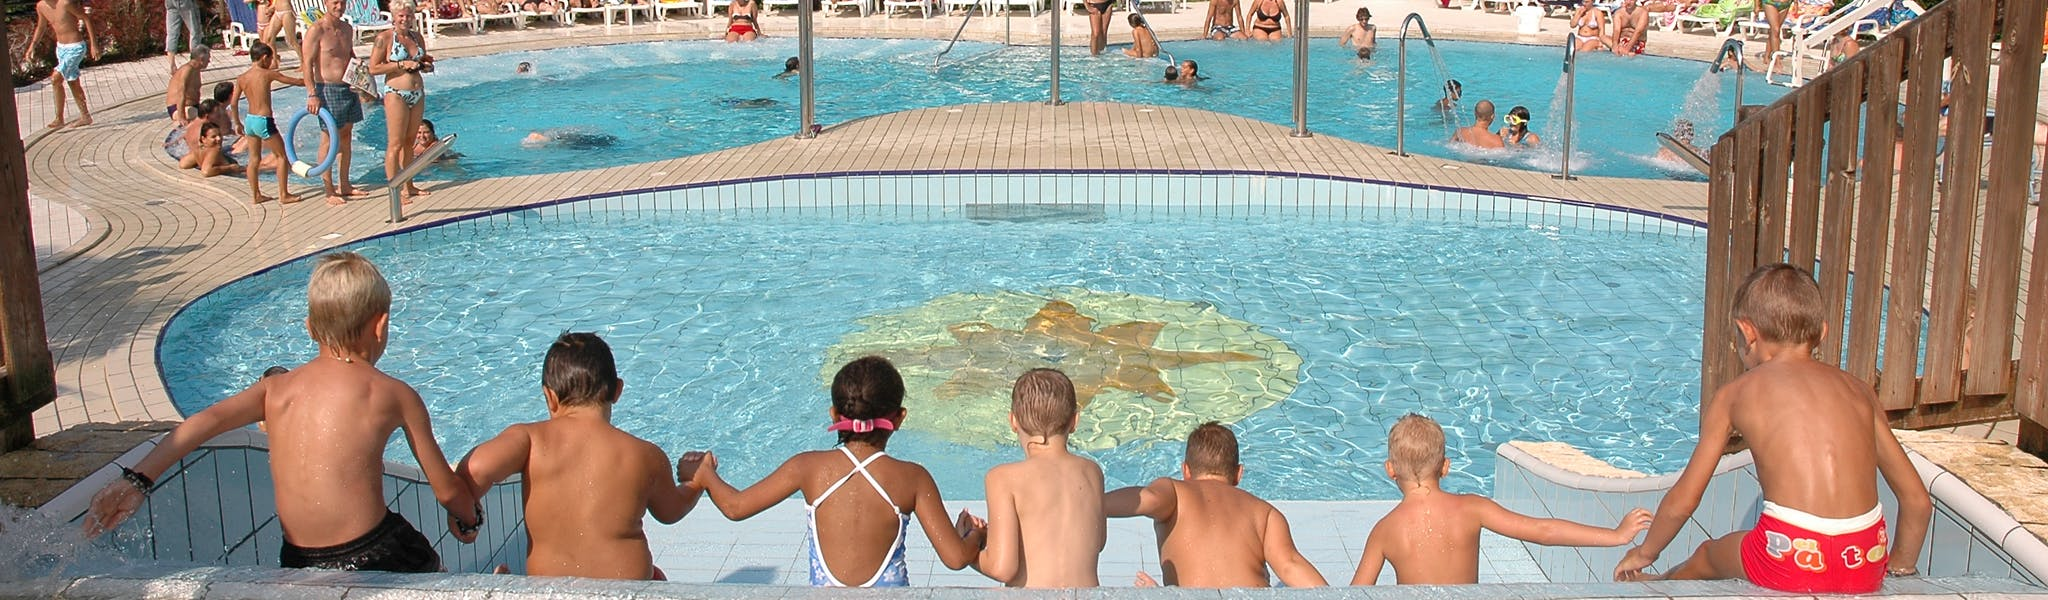 Zwembad camping Sabbiadoro van de glijbaan